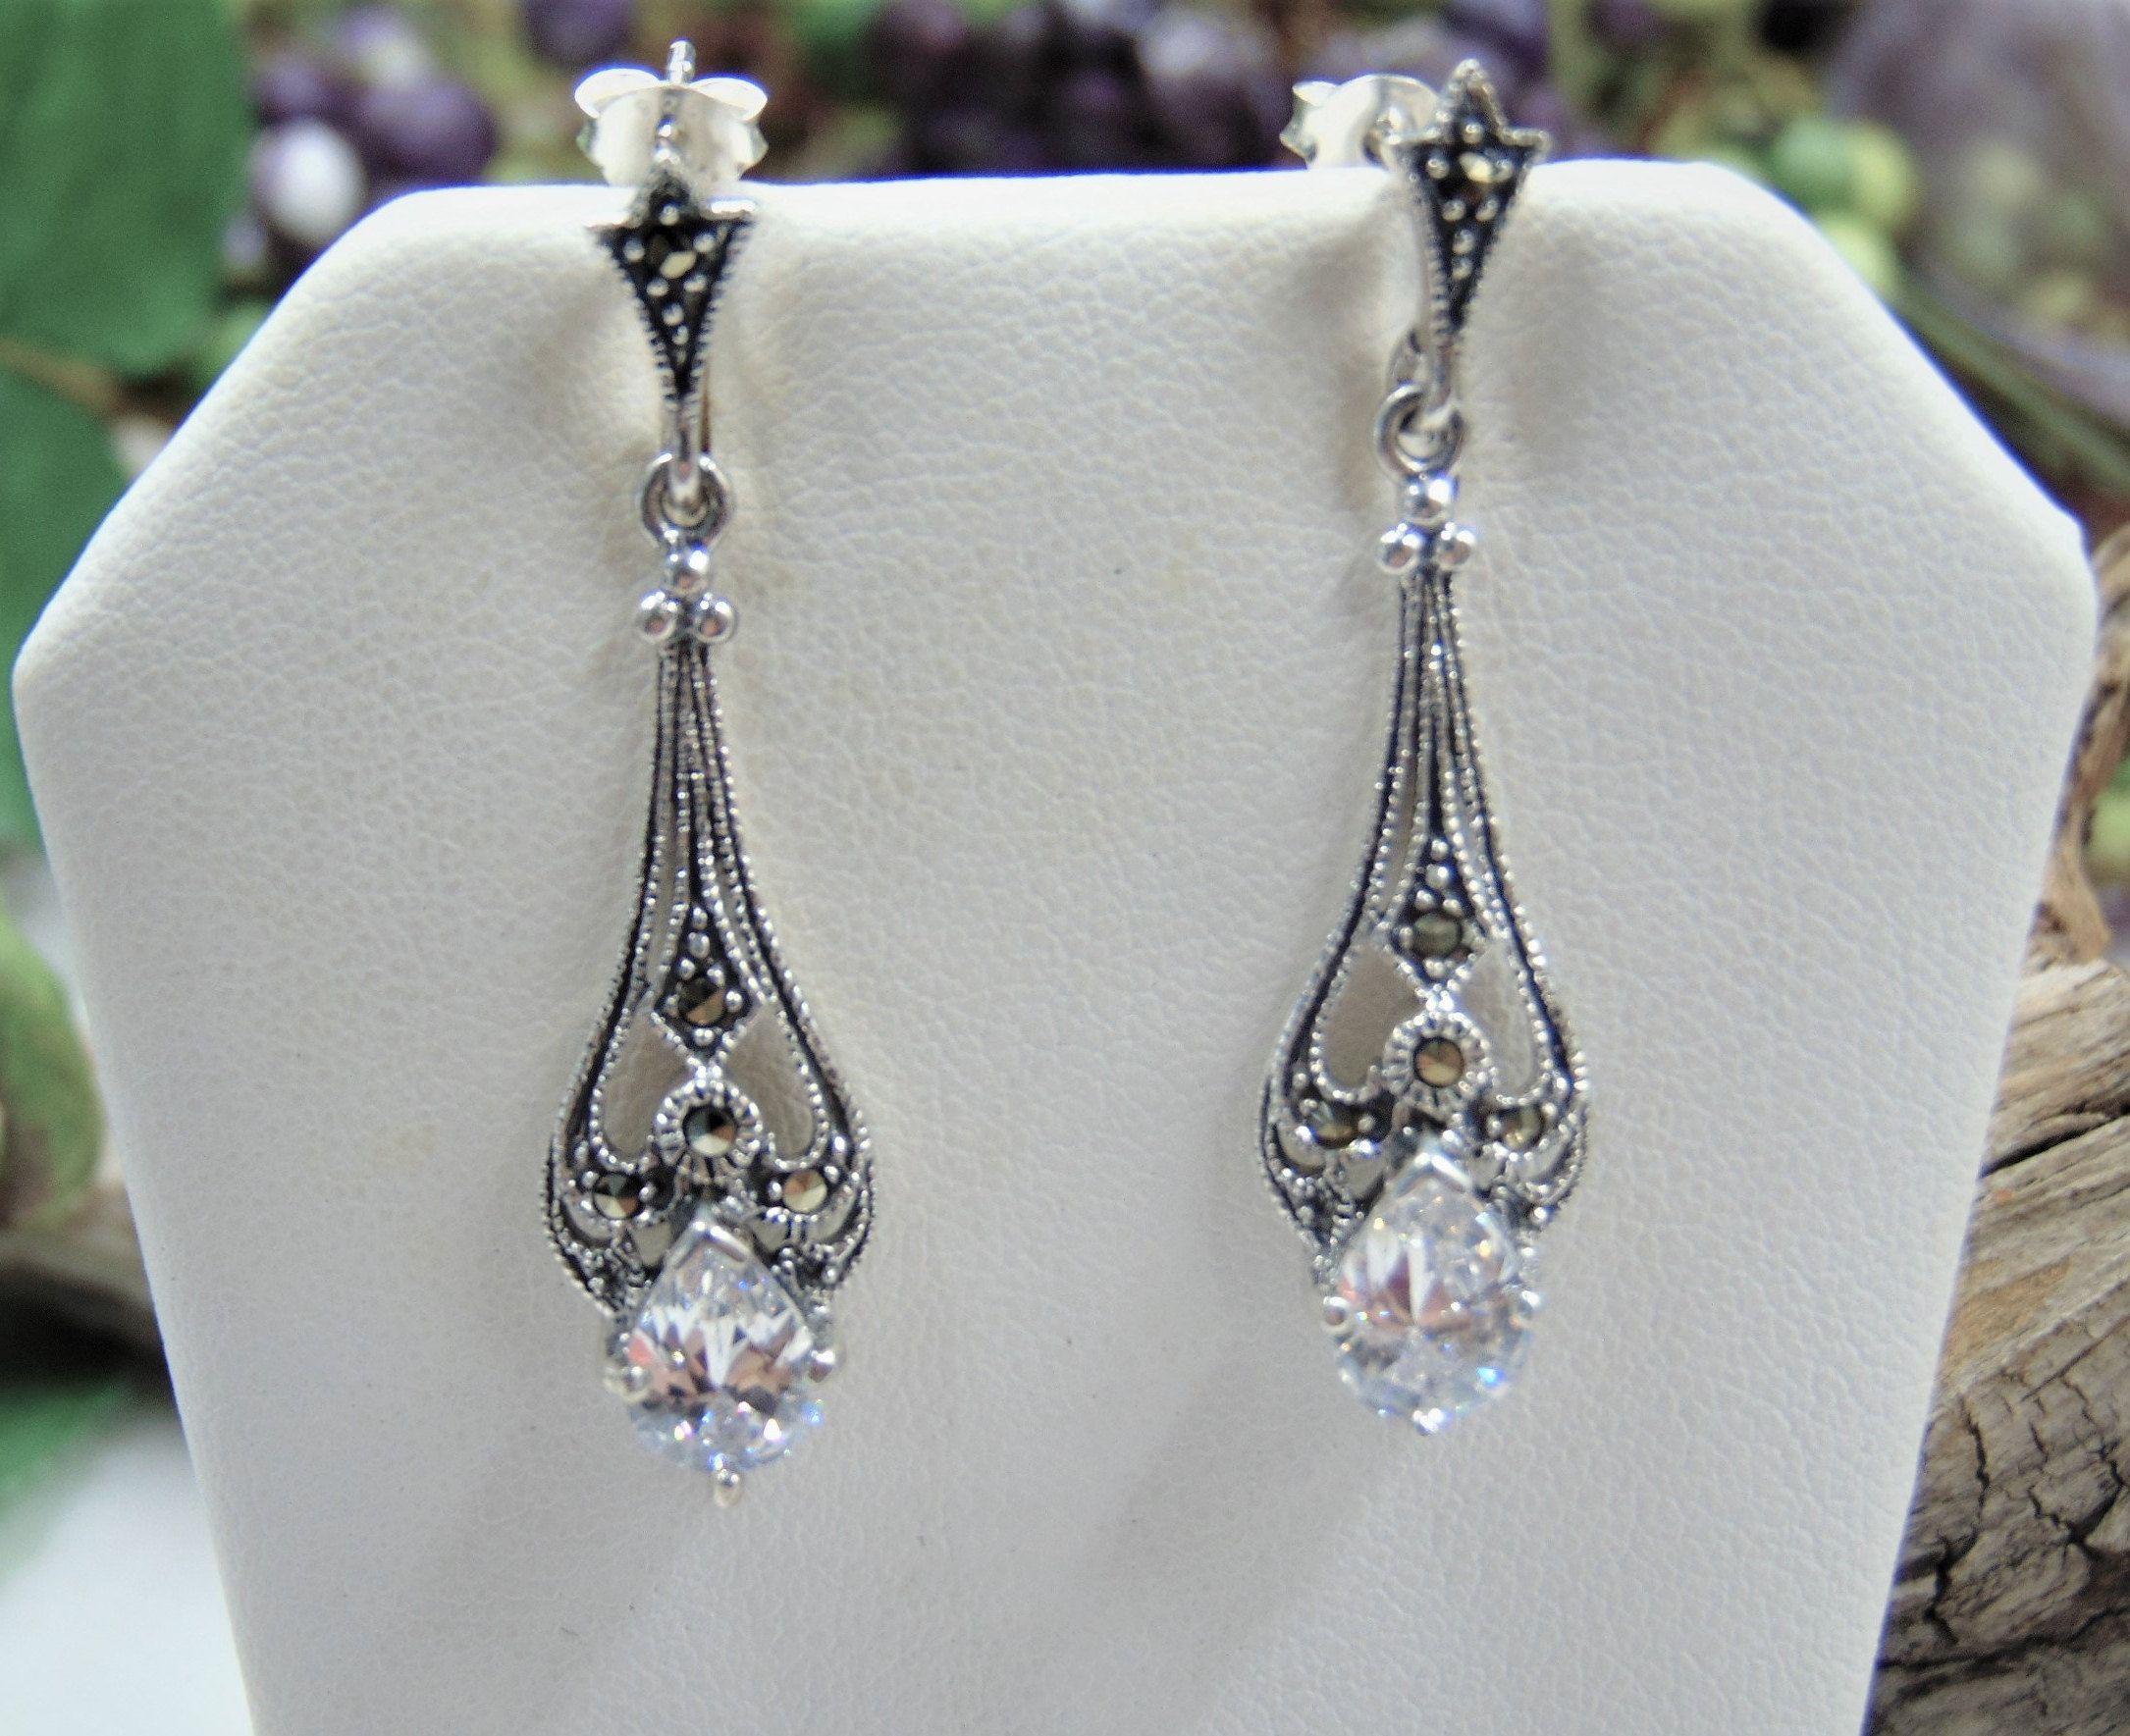 Bridal Earrings Wedding Earringsart Deco Earrings Swarovski Etsy In 2020 Vintage Style Earrings Swarovski Crystal Drop Earrings Arrow Earrings Studs